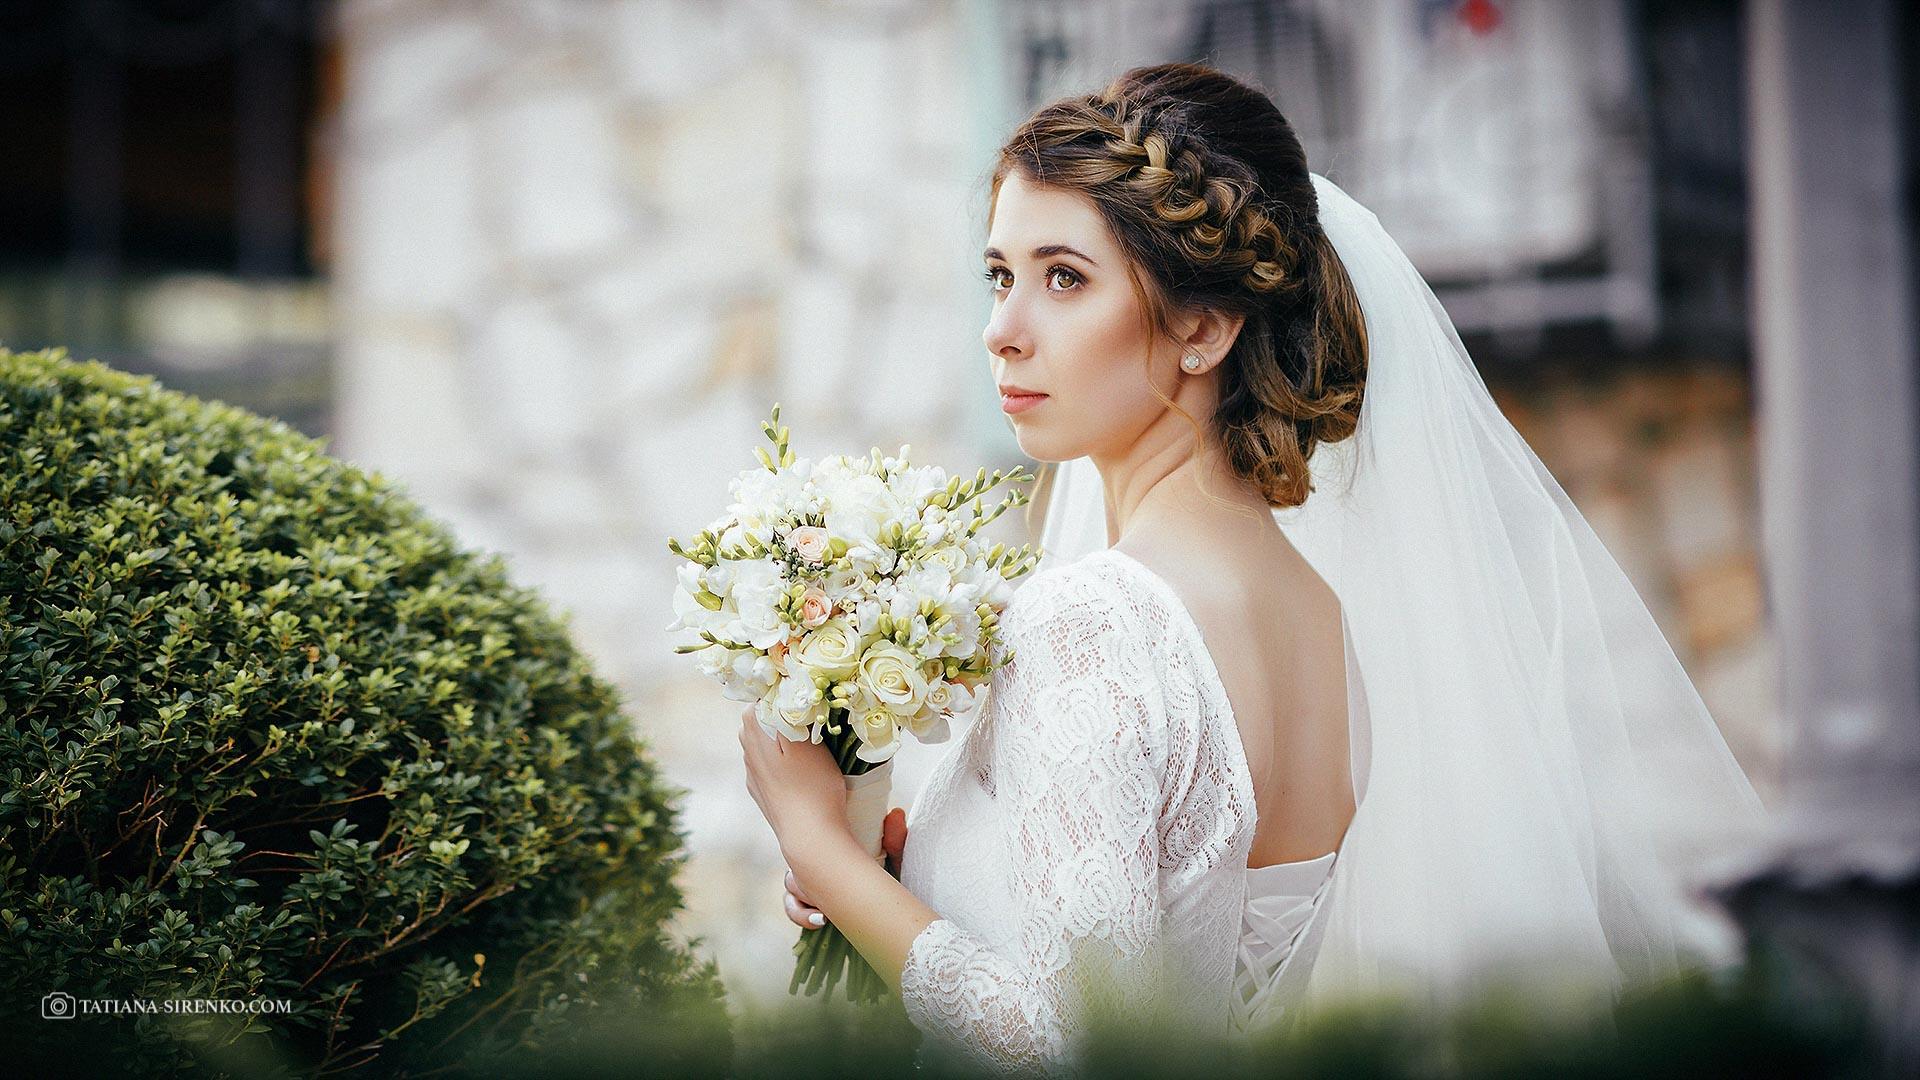 Свадебная фотосъемка на Воздвиженке